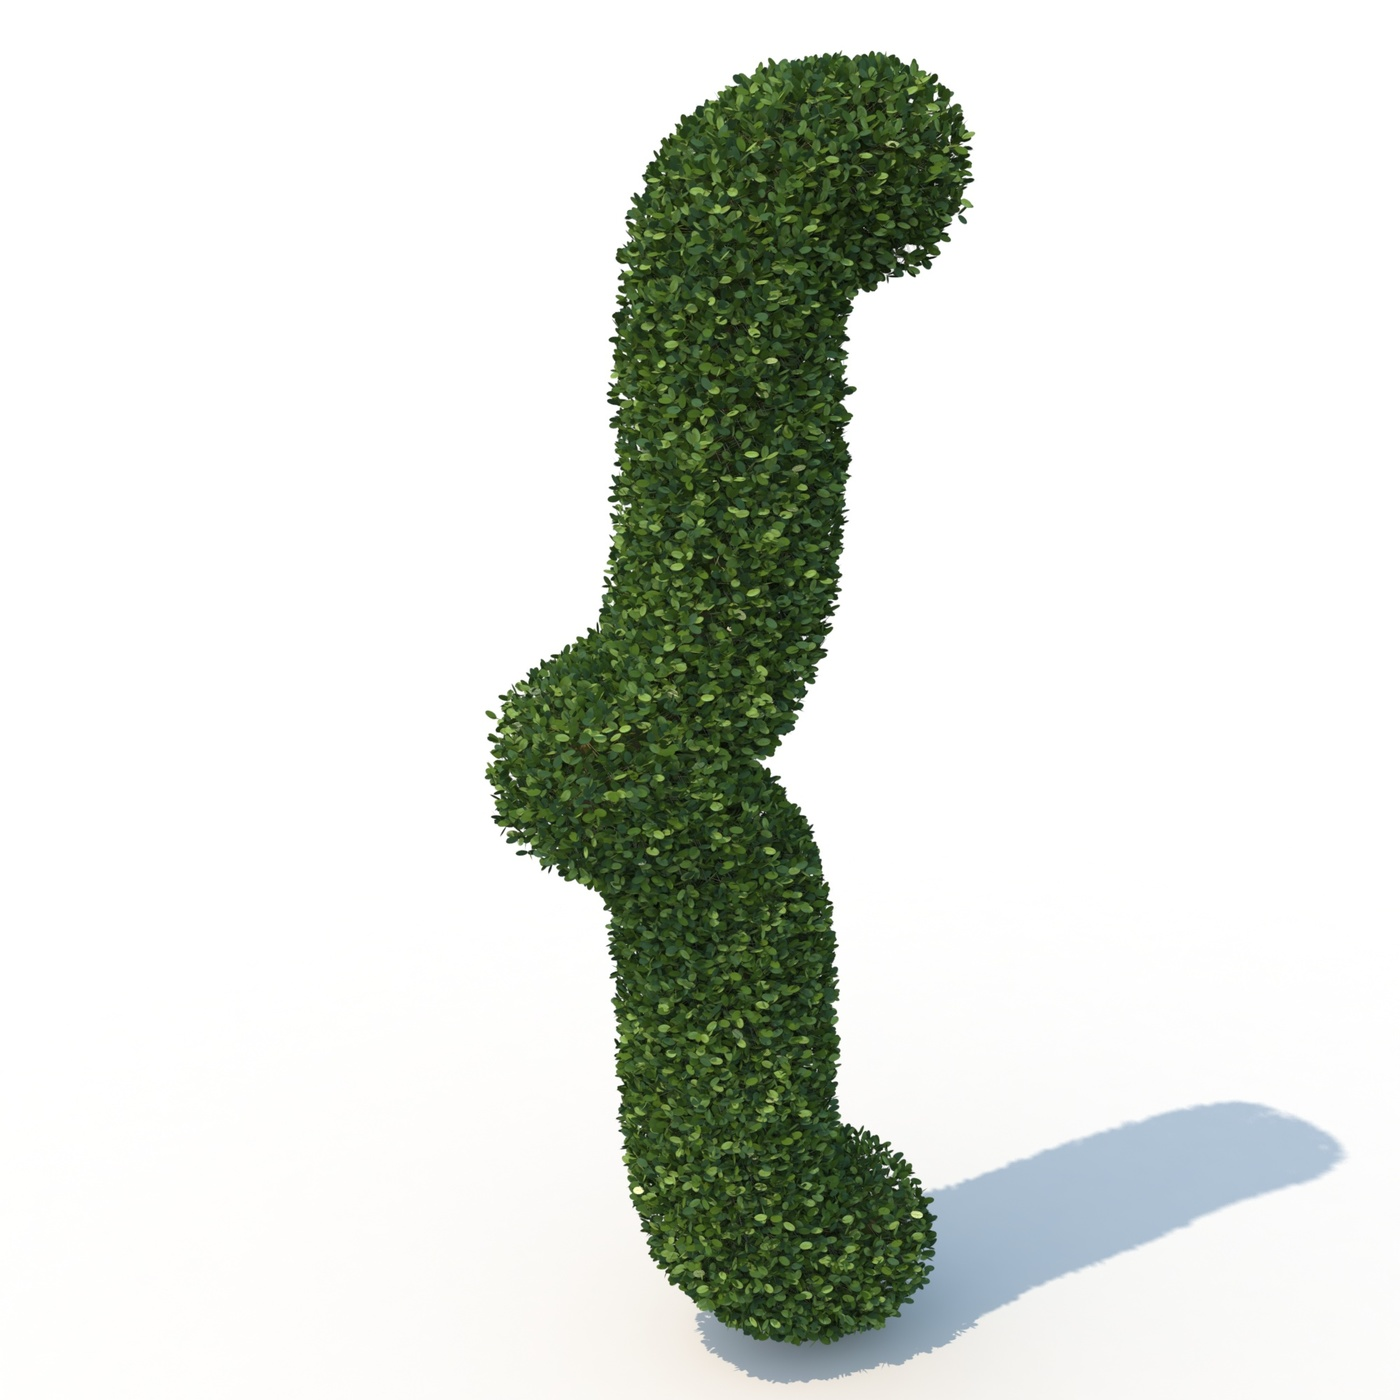 shaped hadges